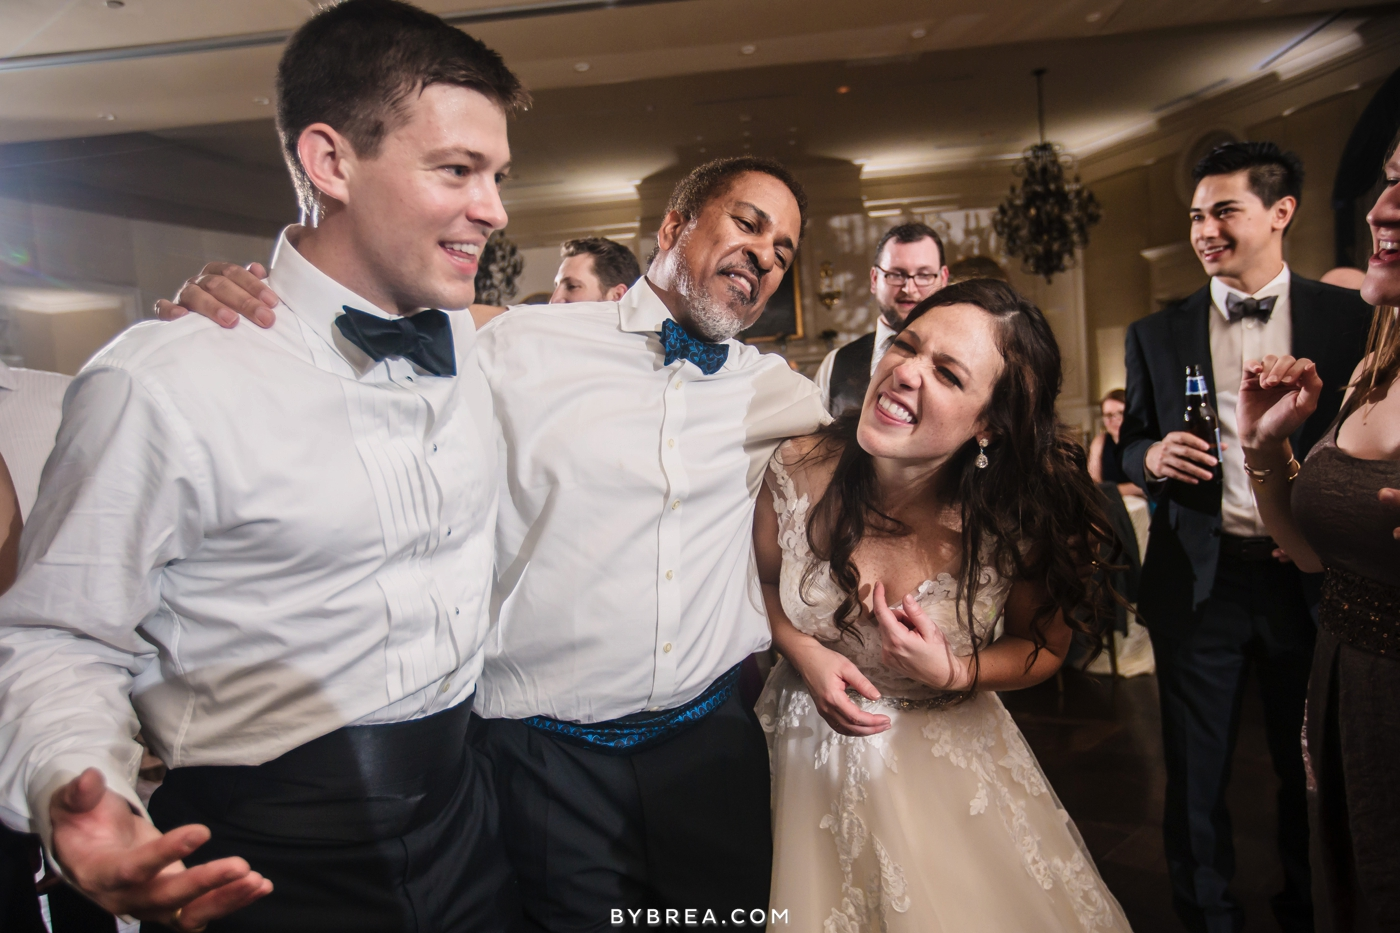 Baltimore wedding partying to DJ Mike Blaufeld